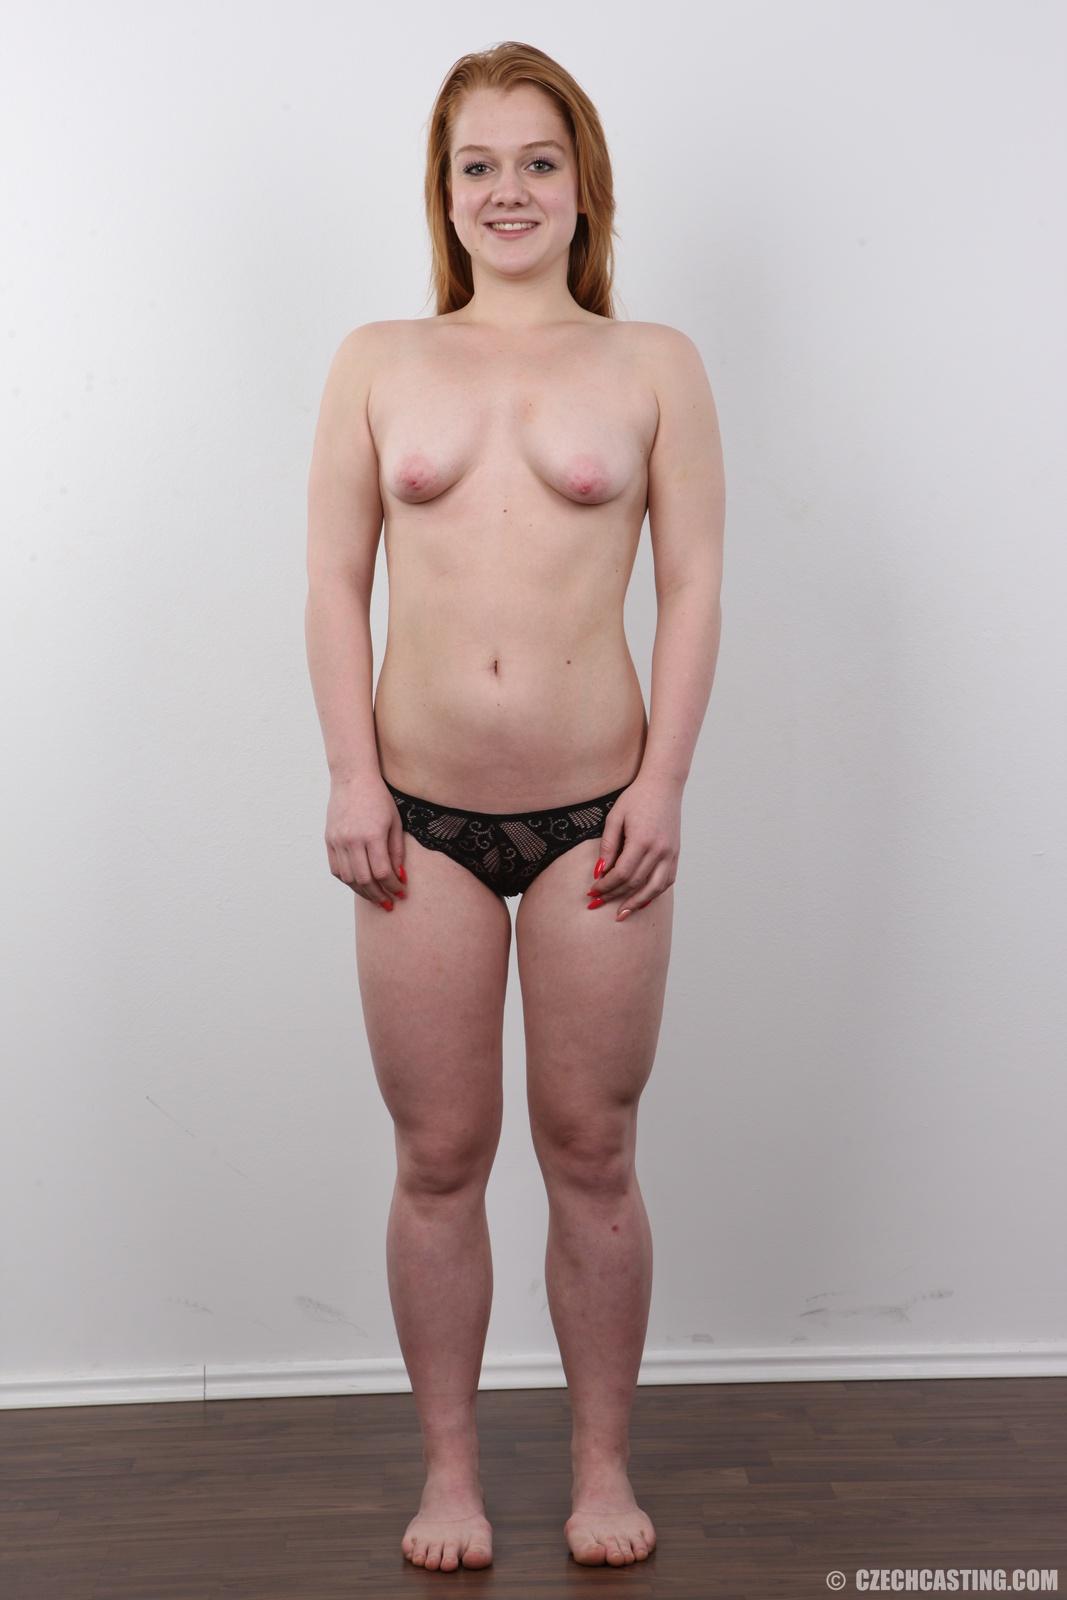 wpid-18-year-old-eliska-casting-photos22.jpg